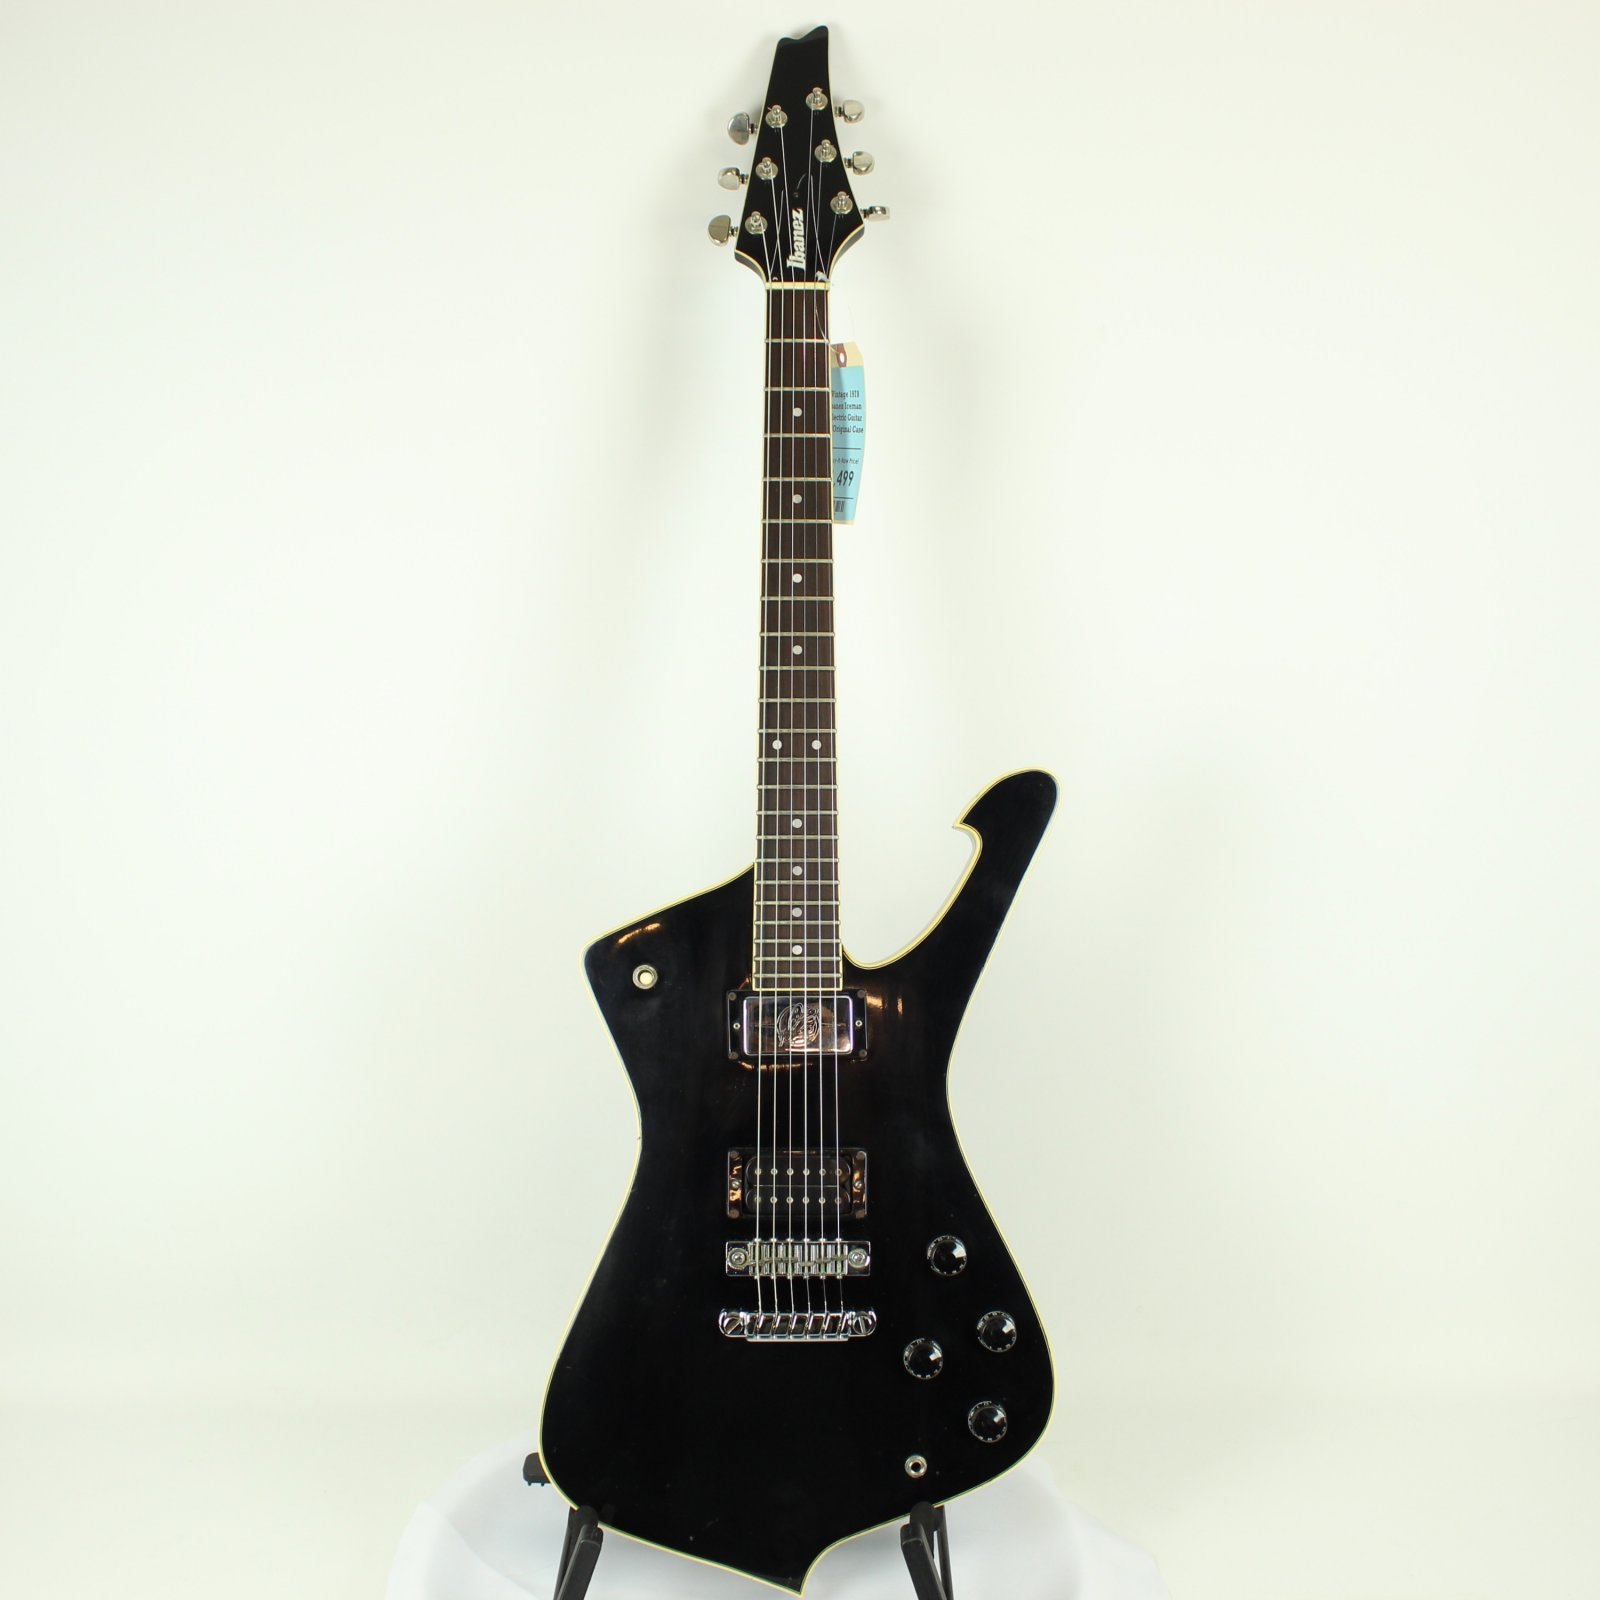 1978 Ibanez Iceman IC100 Electric Guitar w/ Original Case, SN: G784558